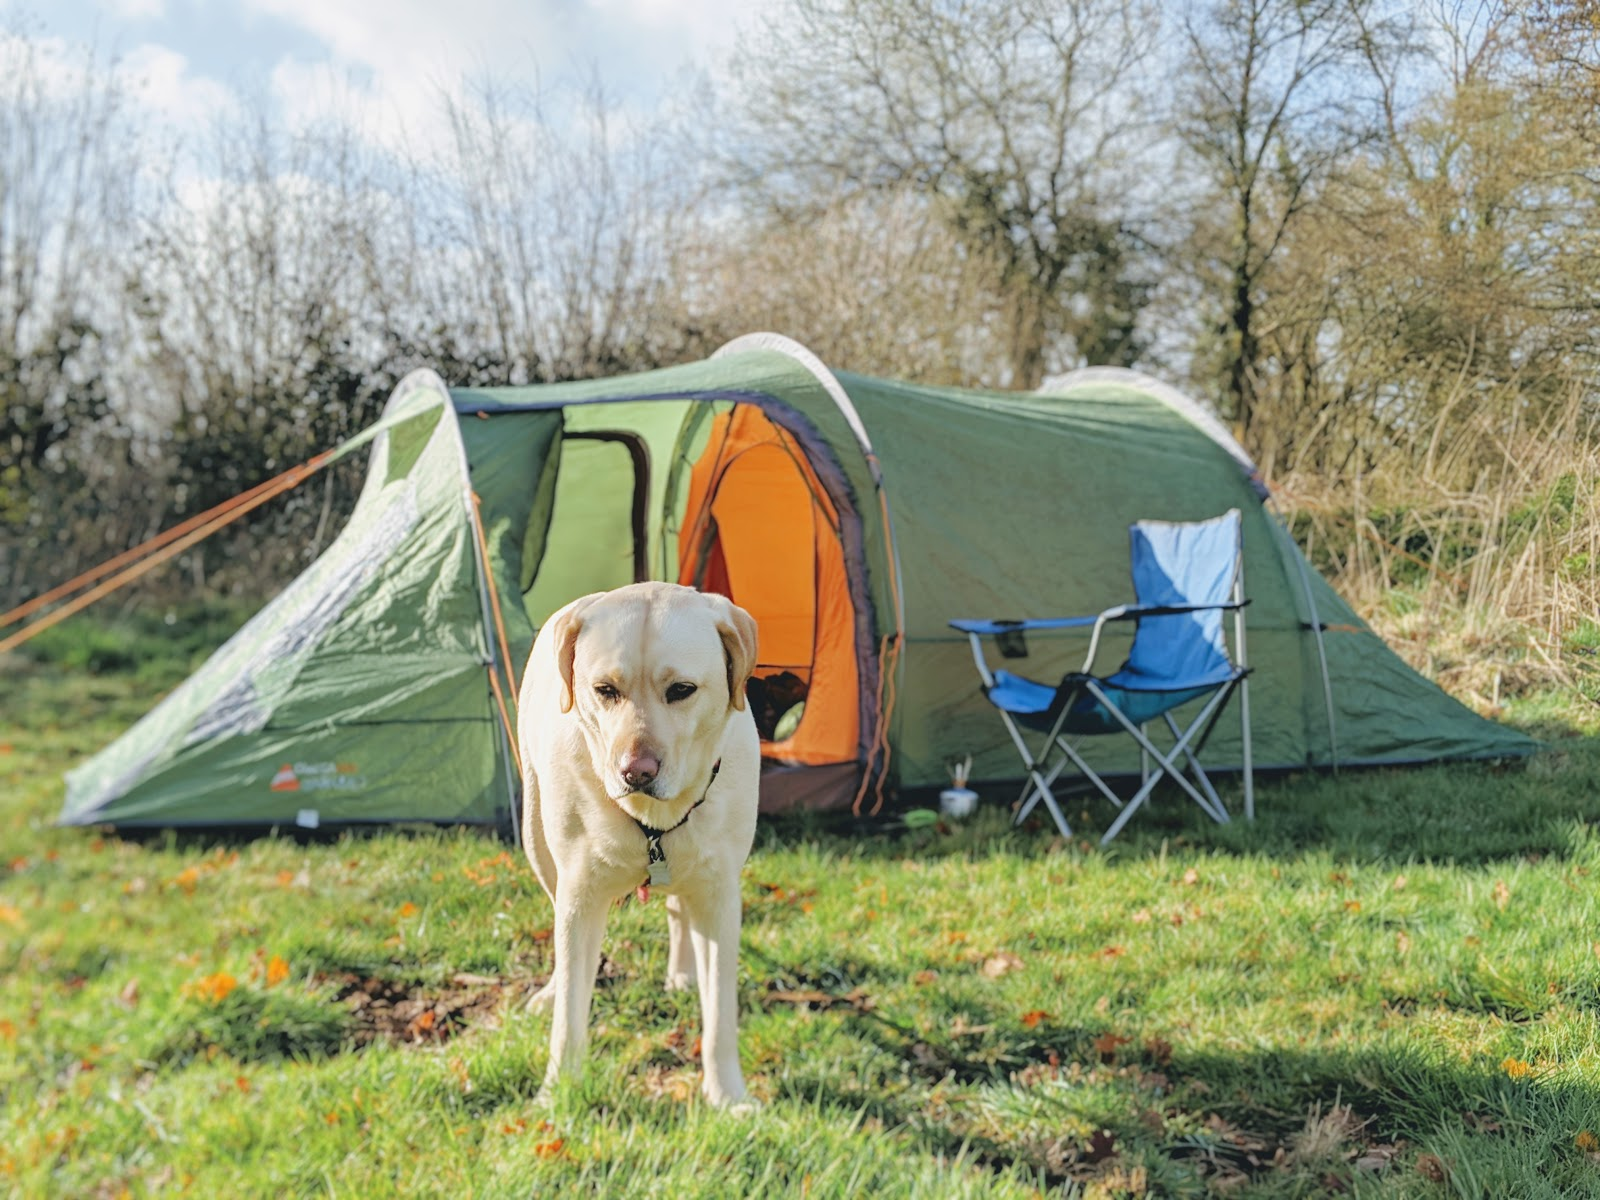 Scully the Labrador enjoying camping